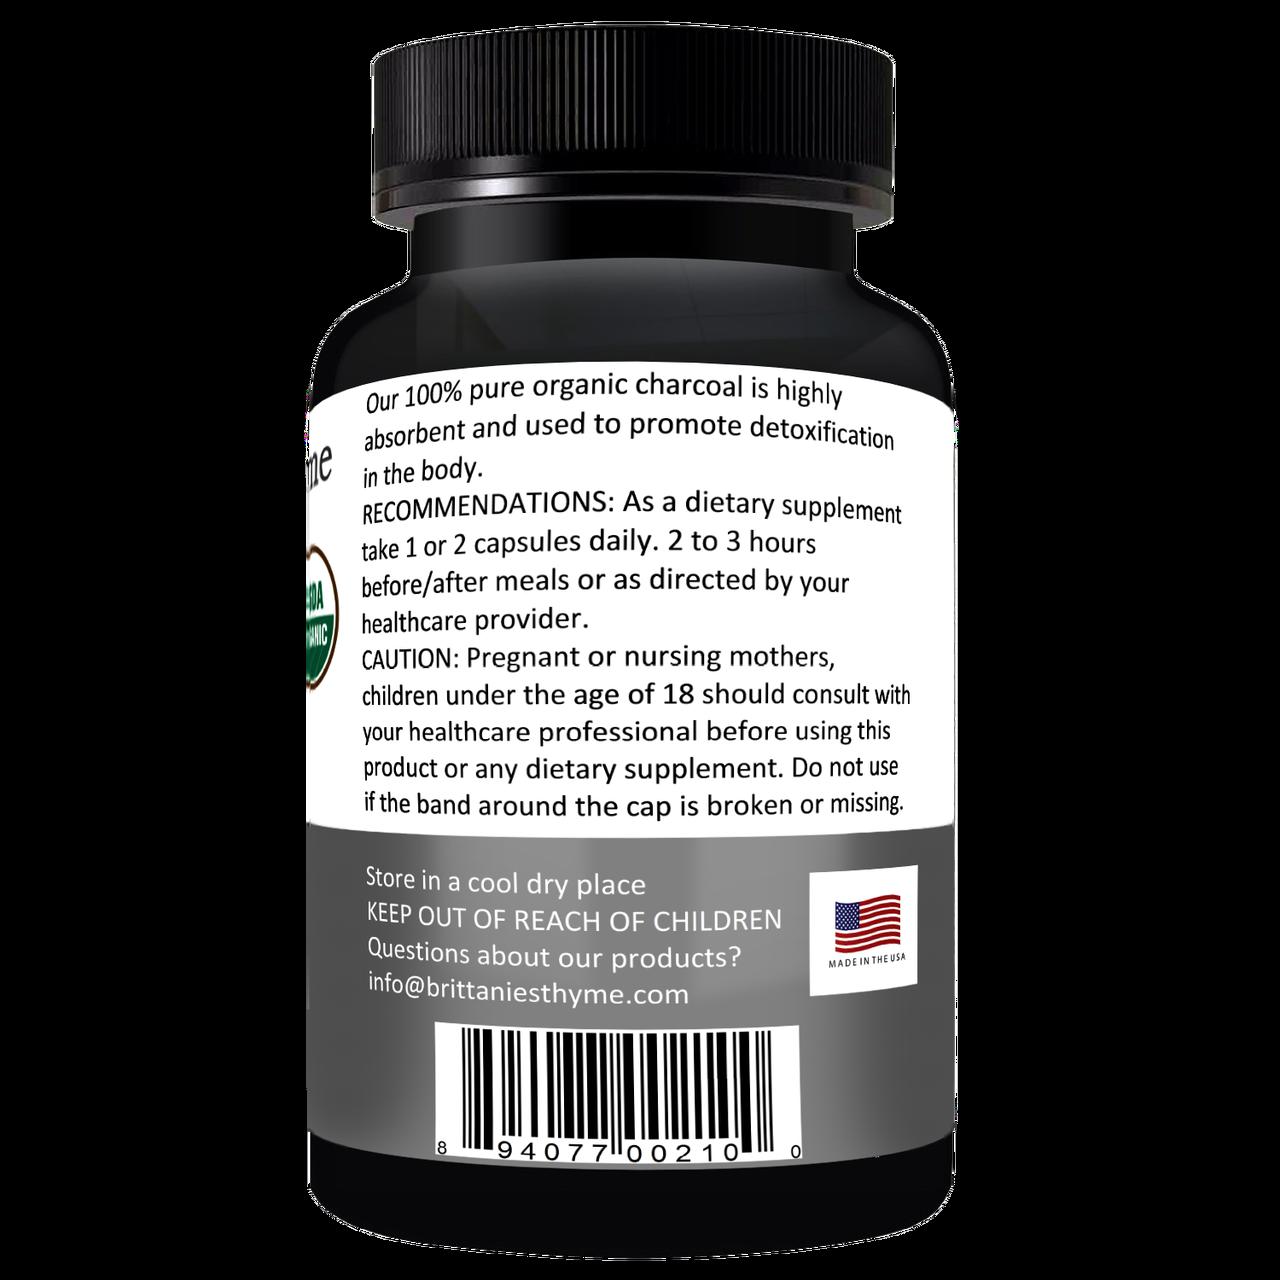 Organic Charcoal Capsules